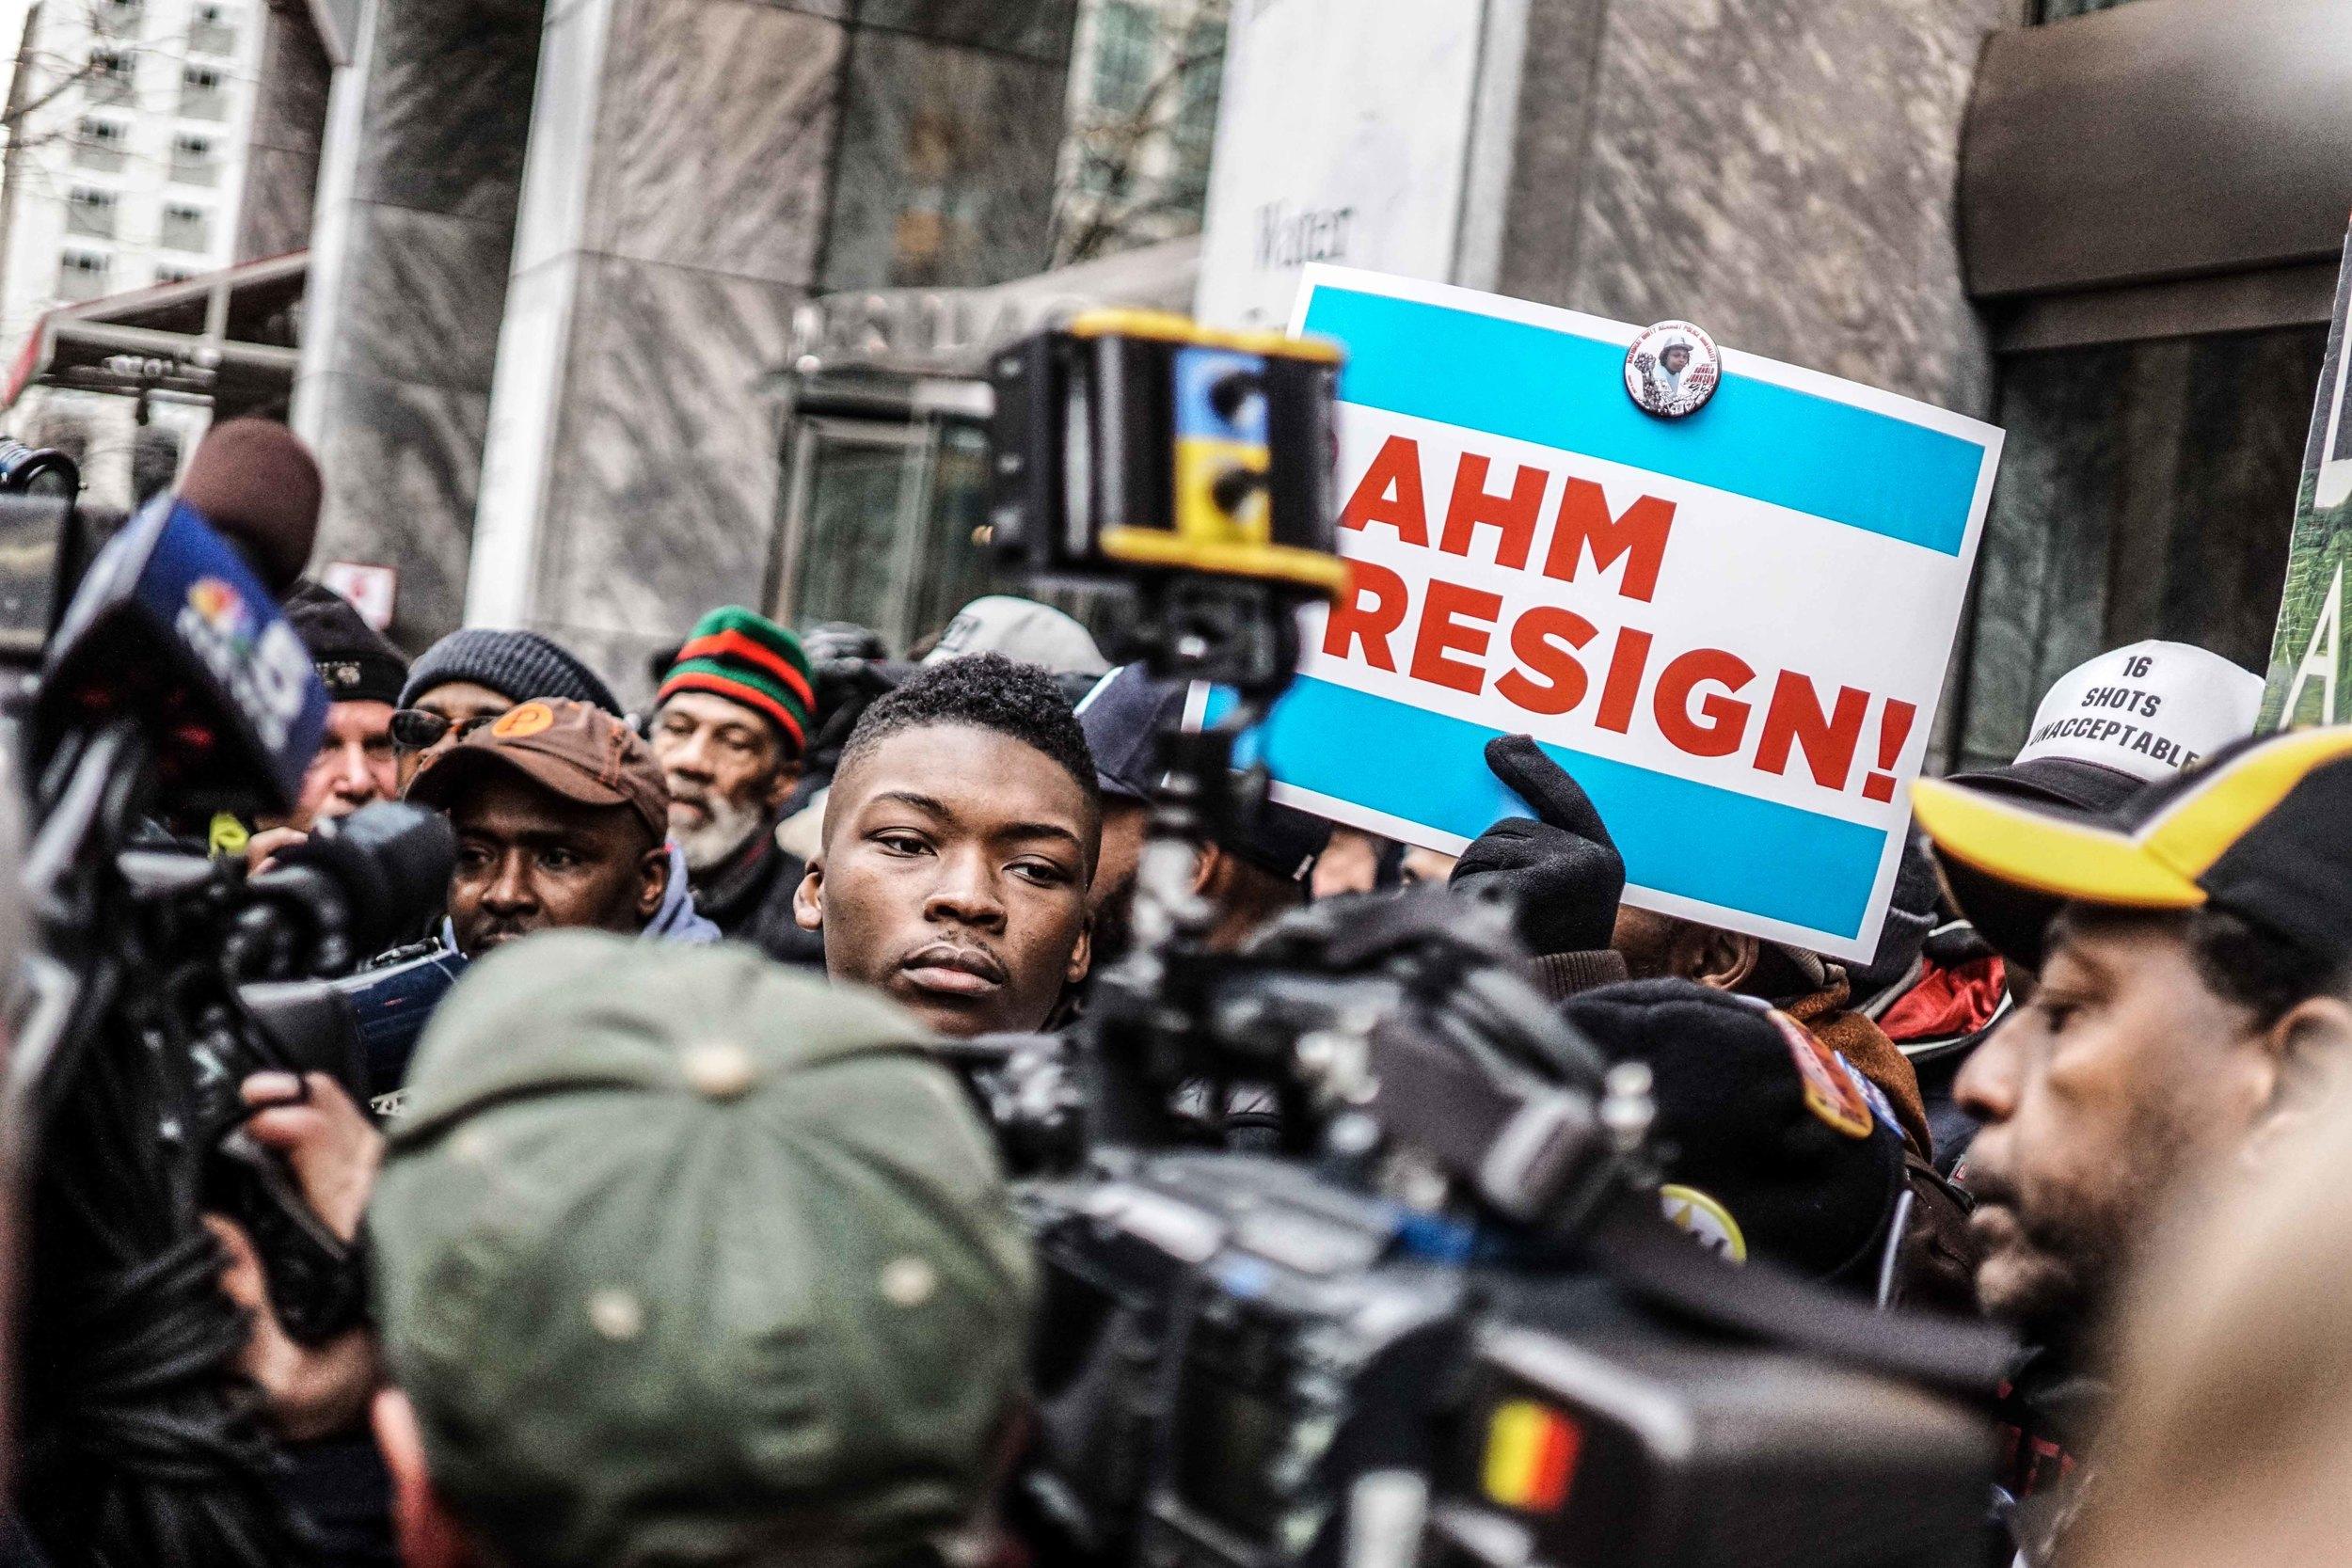 Laquan Mcdonald Protest Resign Rahm Christmas Eve December 2015 Harrison Bruhn 20.jpg